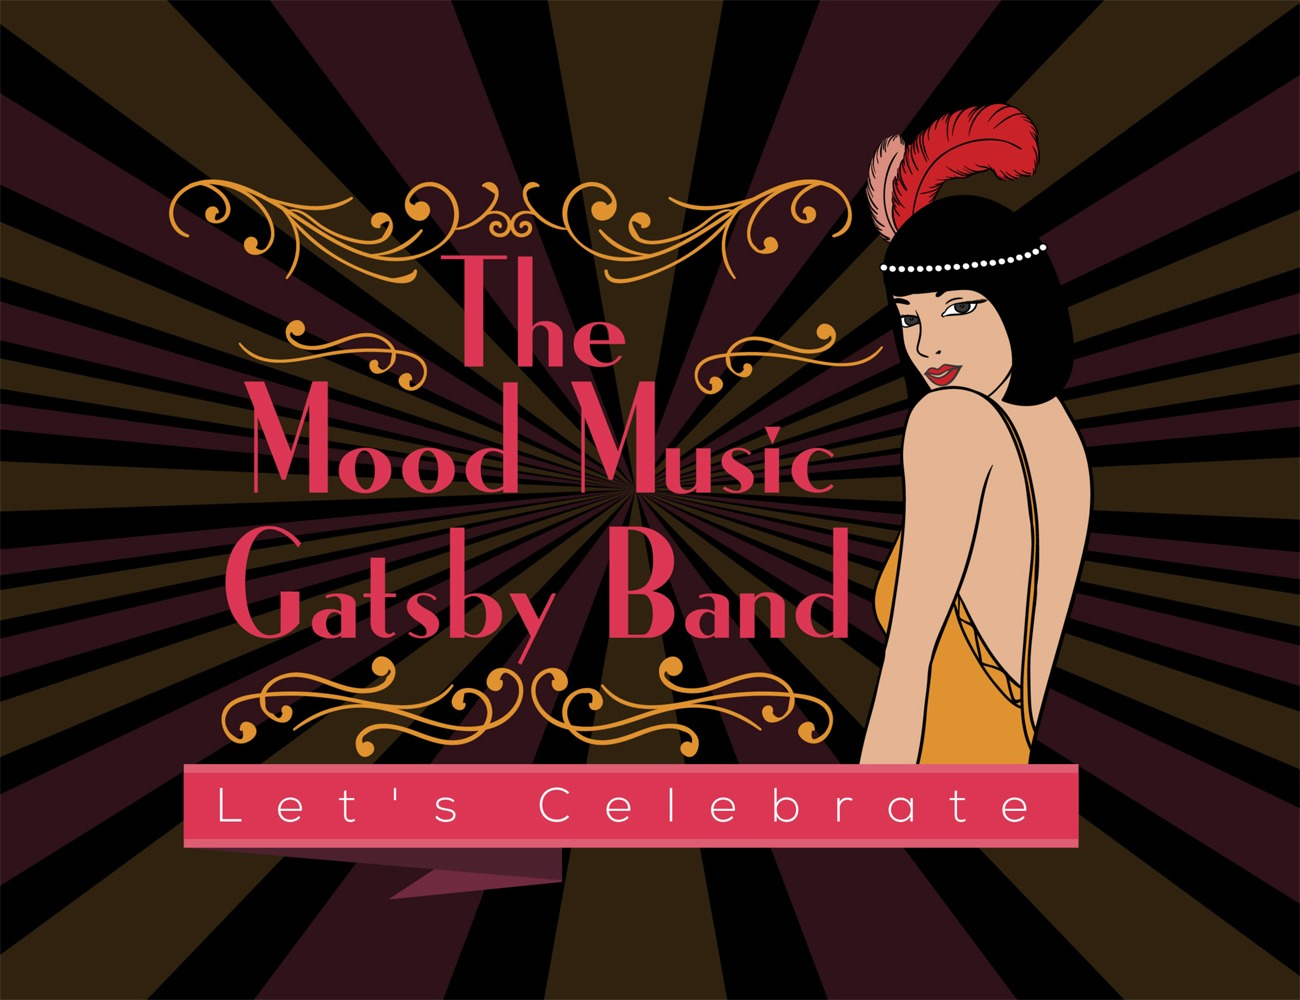 Brisbane's Great Gatsby Band